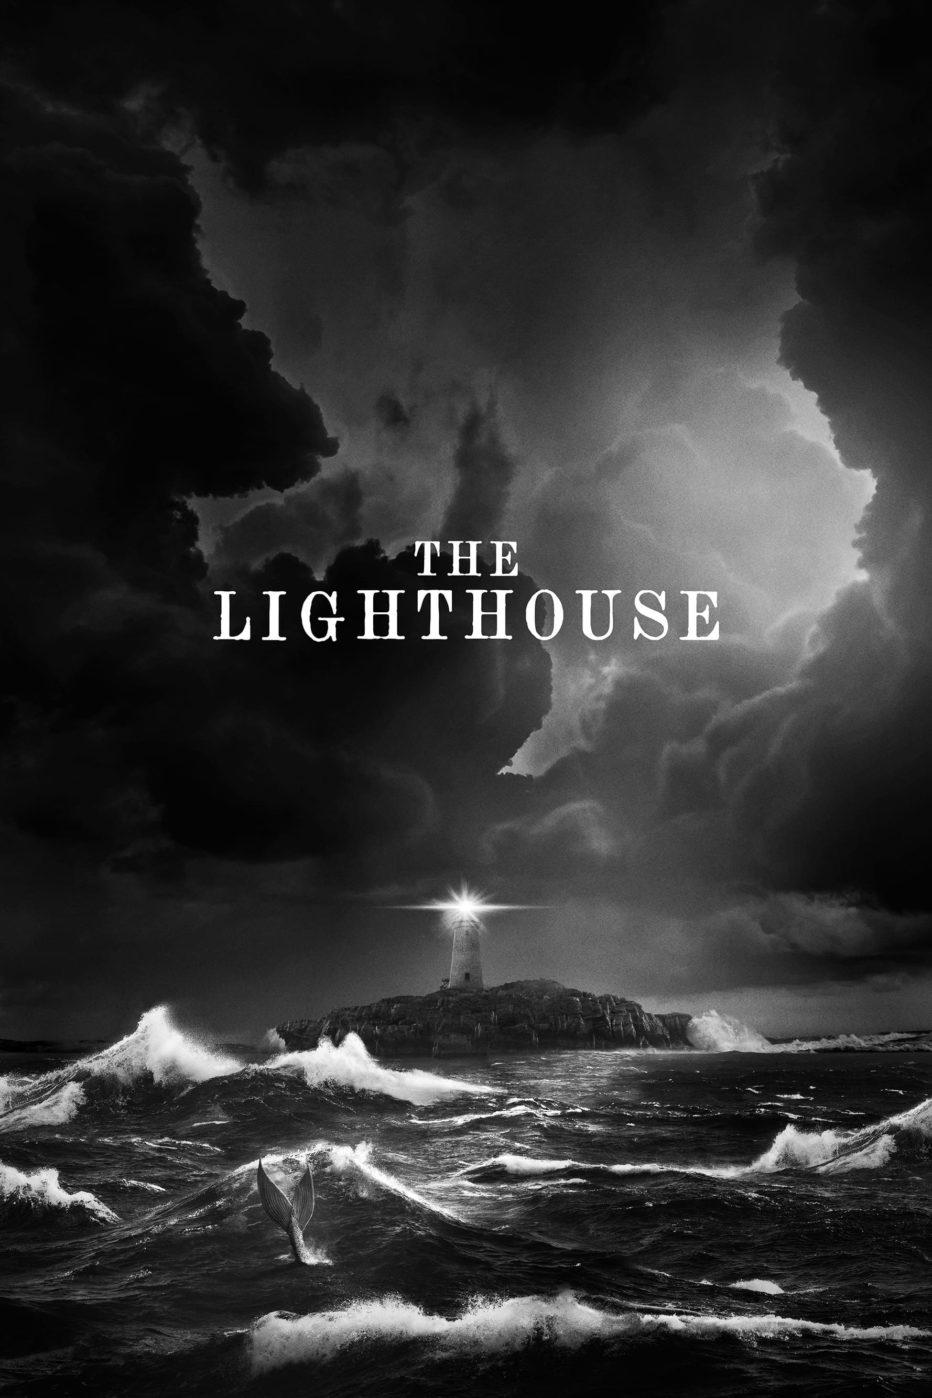 The Lighthouse: El faro de la locura